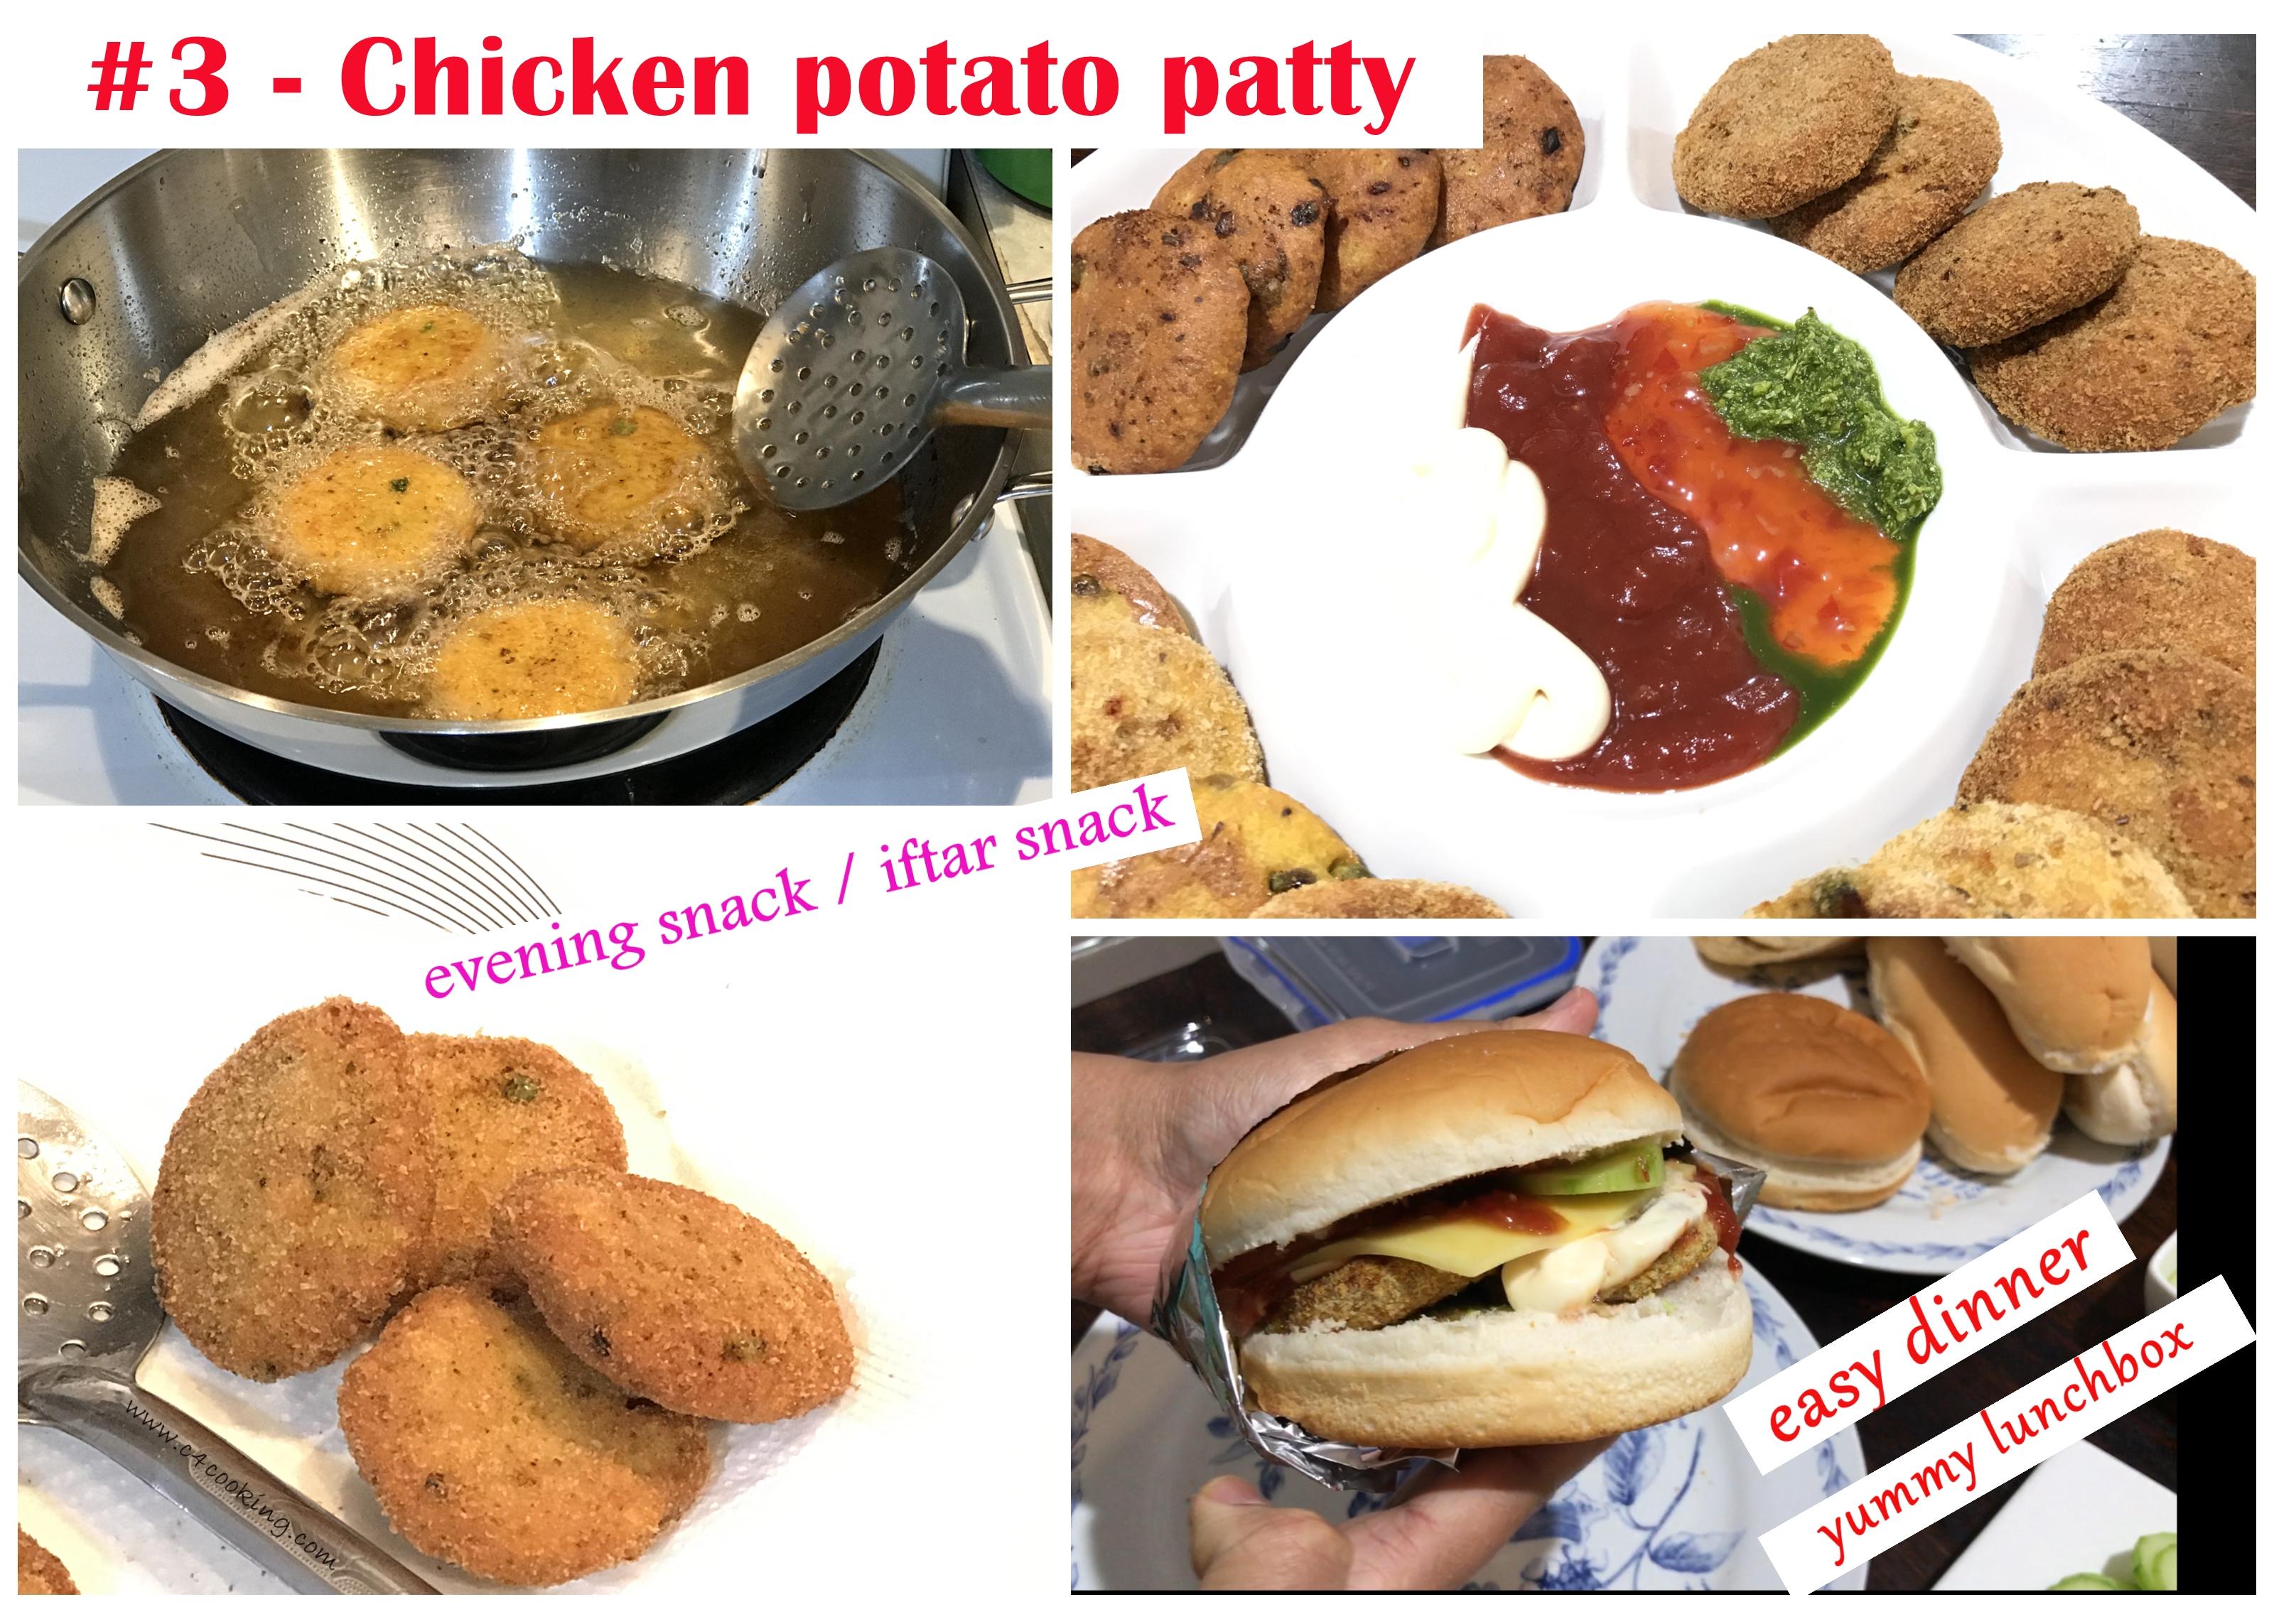 chicken potato patty, c4cooking indian chicken potato cutlet, iftar snack, ramadan recipes, chicken recipes, luncbox, dinner burger, chicken burger